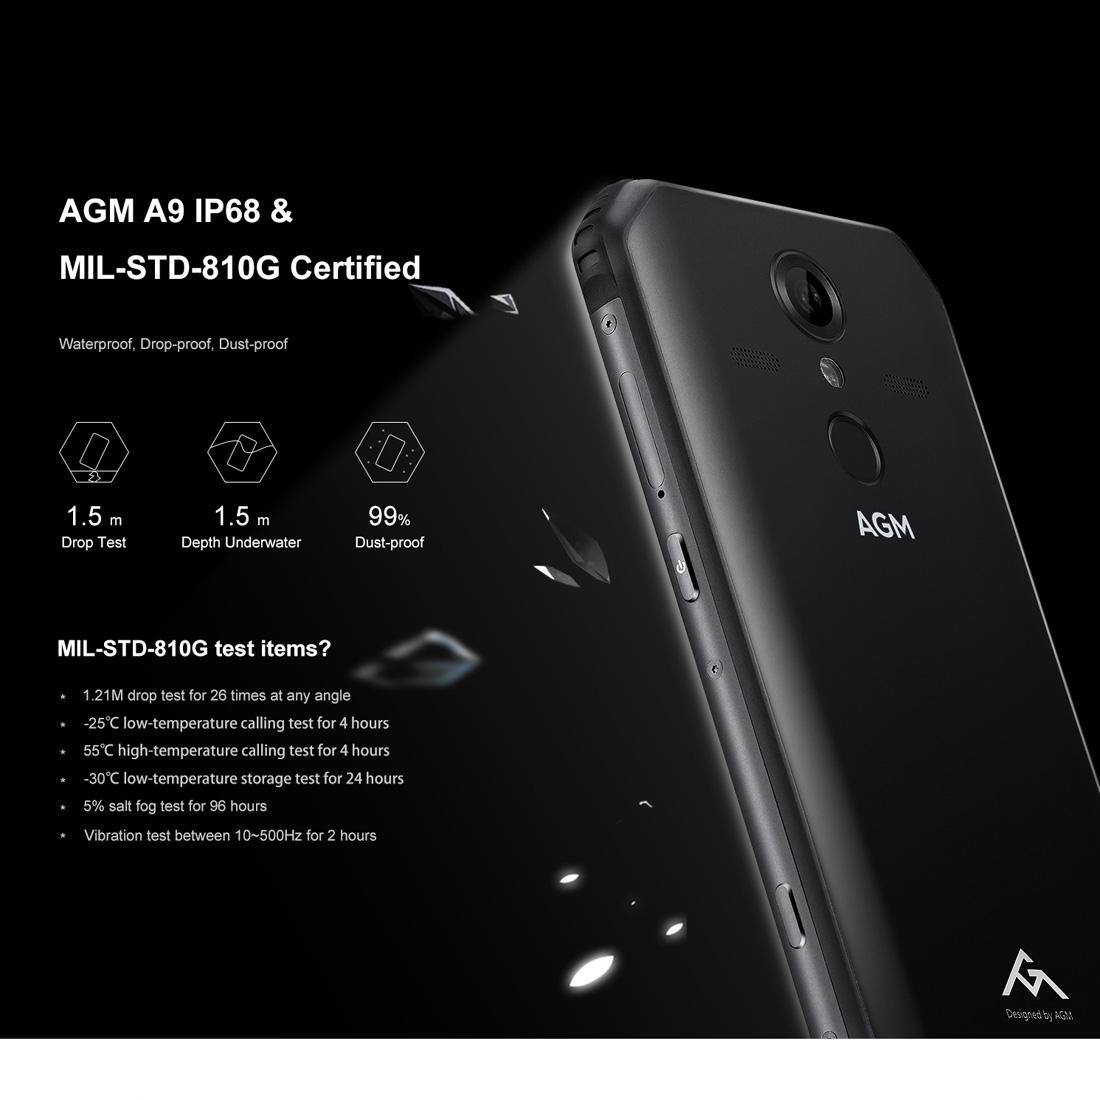 AGM A9 Rugged Phone, 4GB+64GB, IP68 Waterproof Dustproof Shockproof, Fingerprint Identification, 5400mAh Battery, 5.99 inch Android 8.1 Qualcomm SDM450 Octa Core, Network: 4G, OTG, NFC (Black)